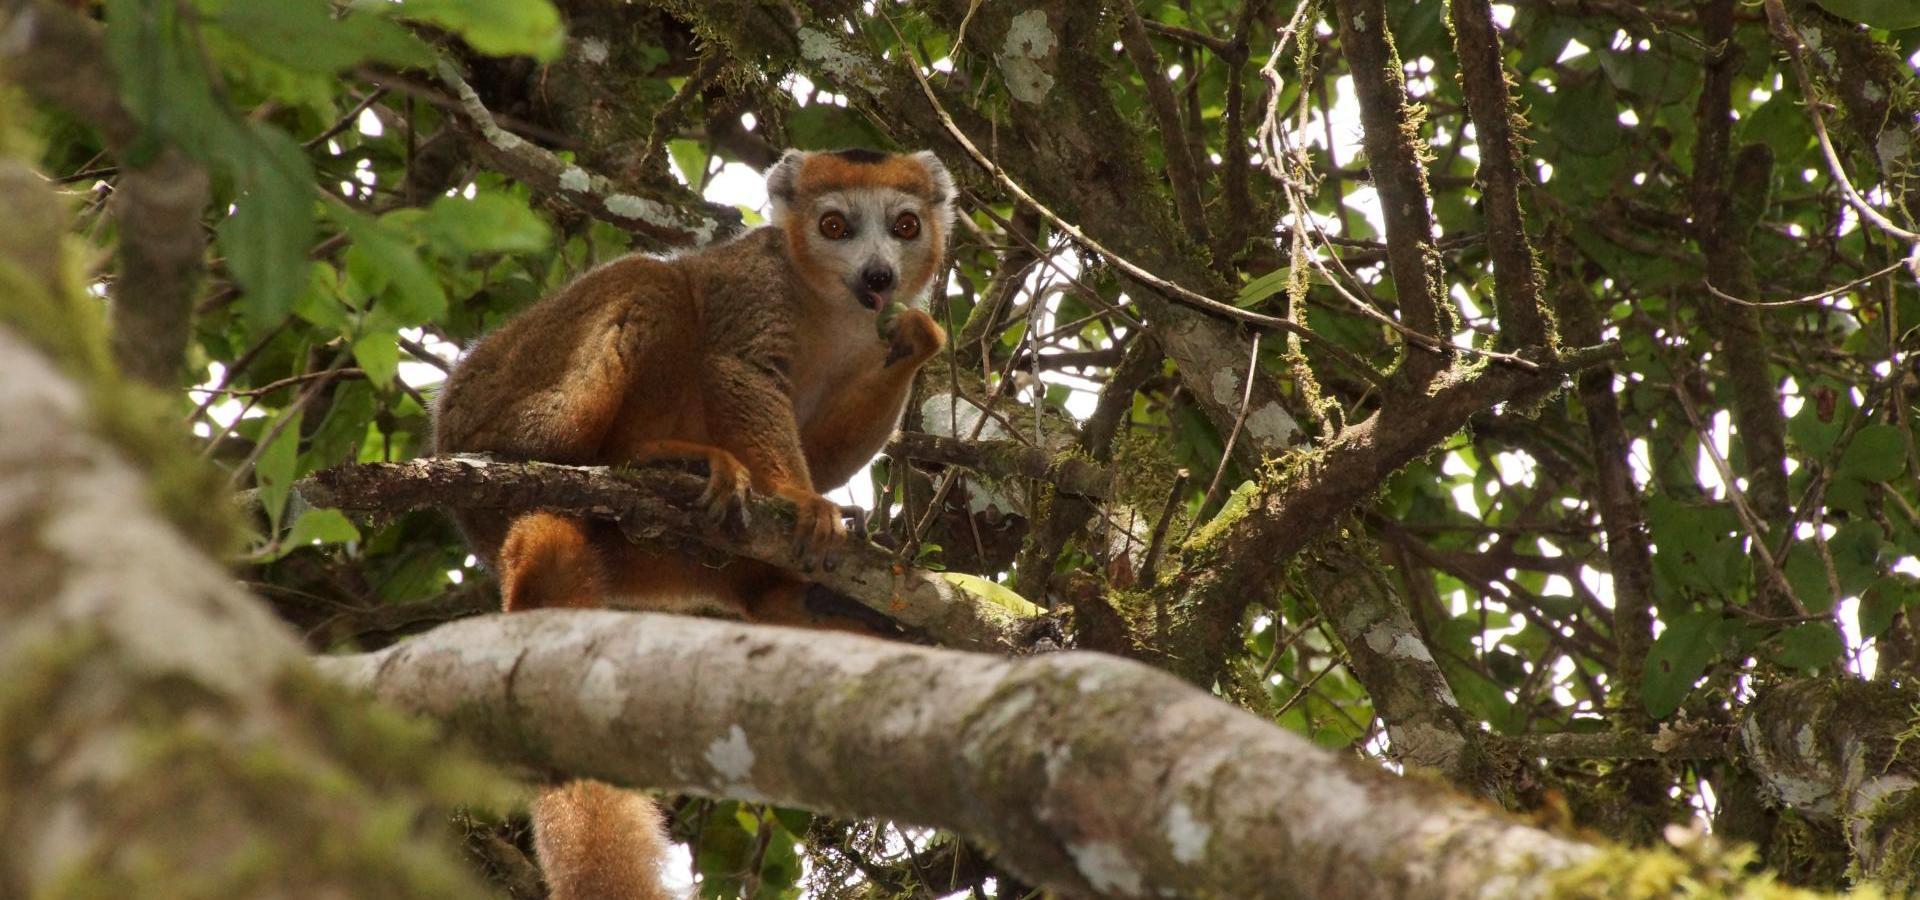 Madagaskar Highlights – Natur, Kultur & Lemuren - Geführte deutschsprachige Kleingruppenreise